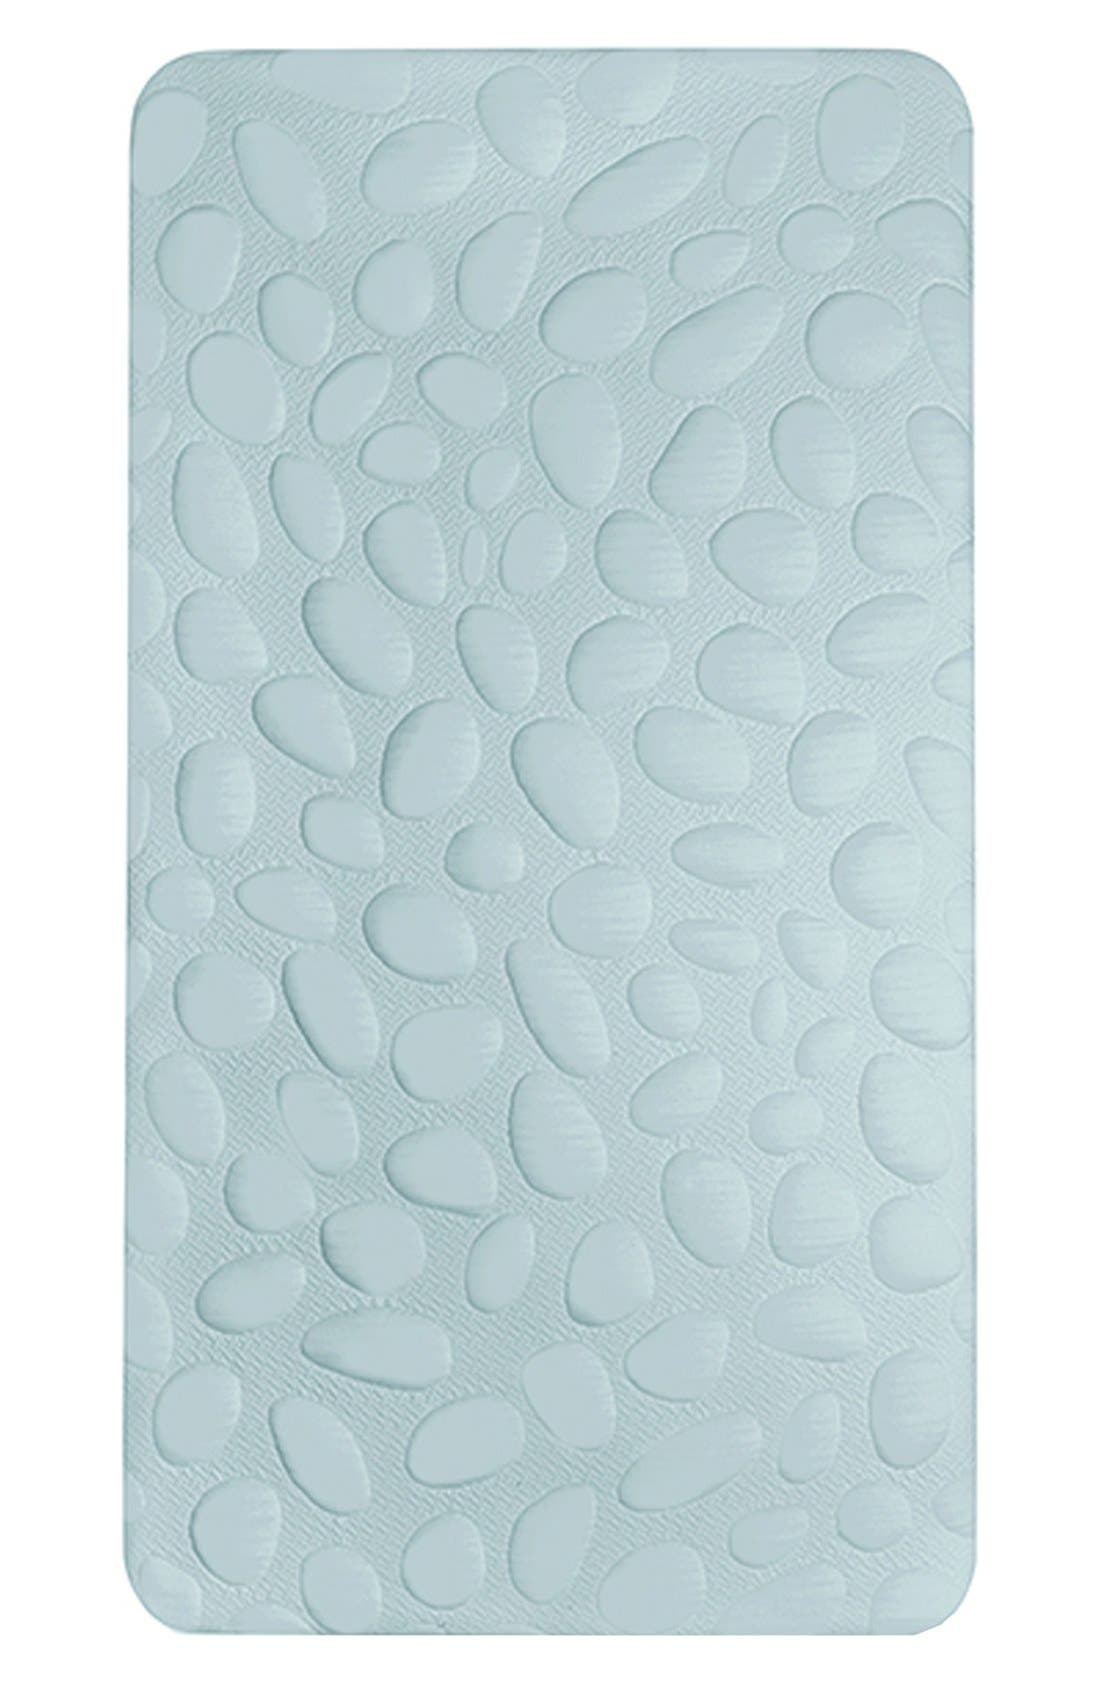 Nook Sleep Systems 'Pebble Air' Crib Mattress